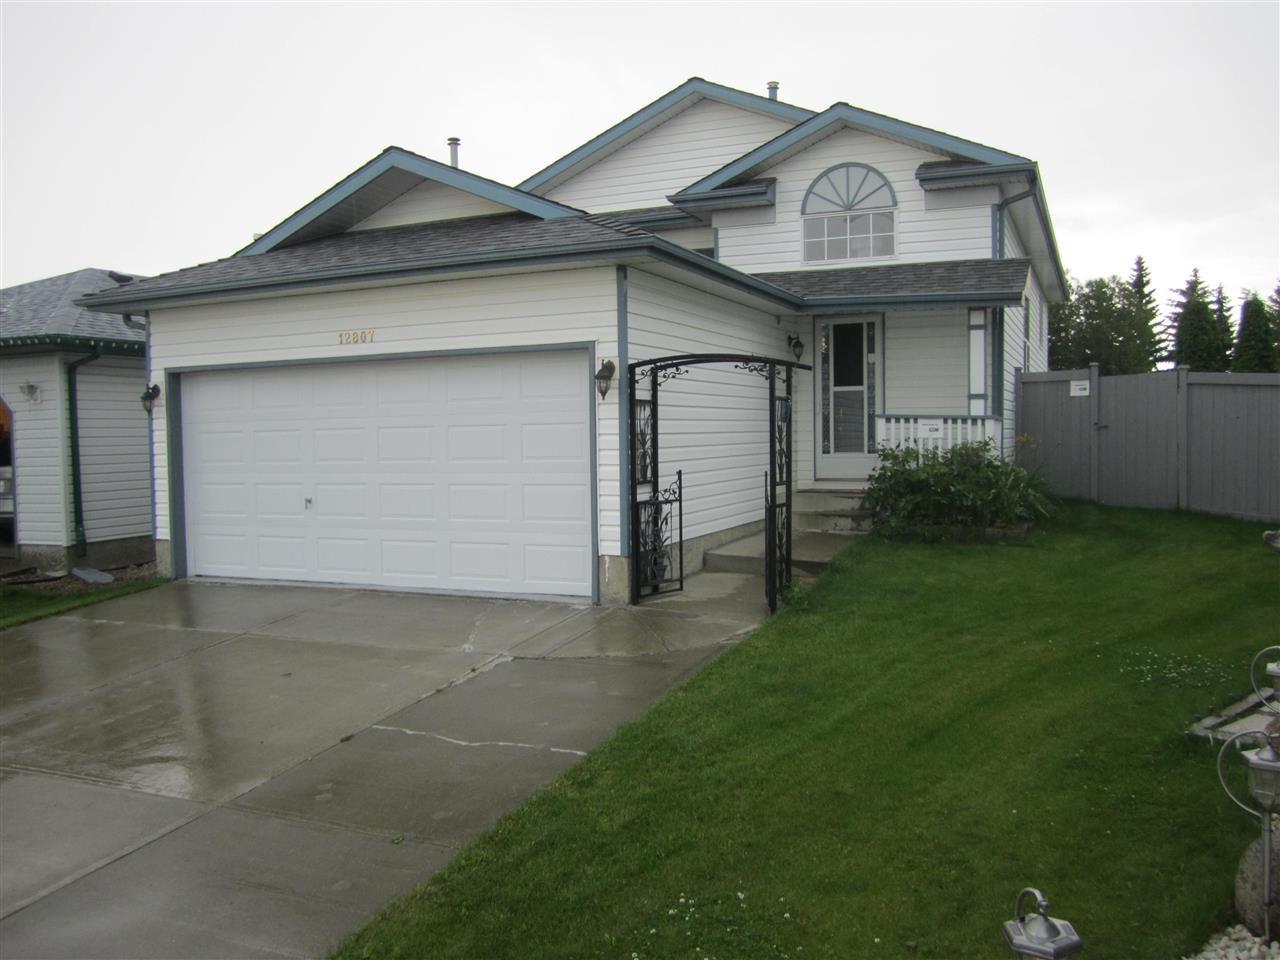 Main Photo: 12807 149 Avenue in Edmonton: Zone 27 House for sale : MLS®# E4206214